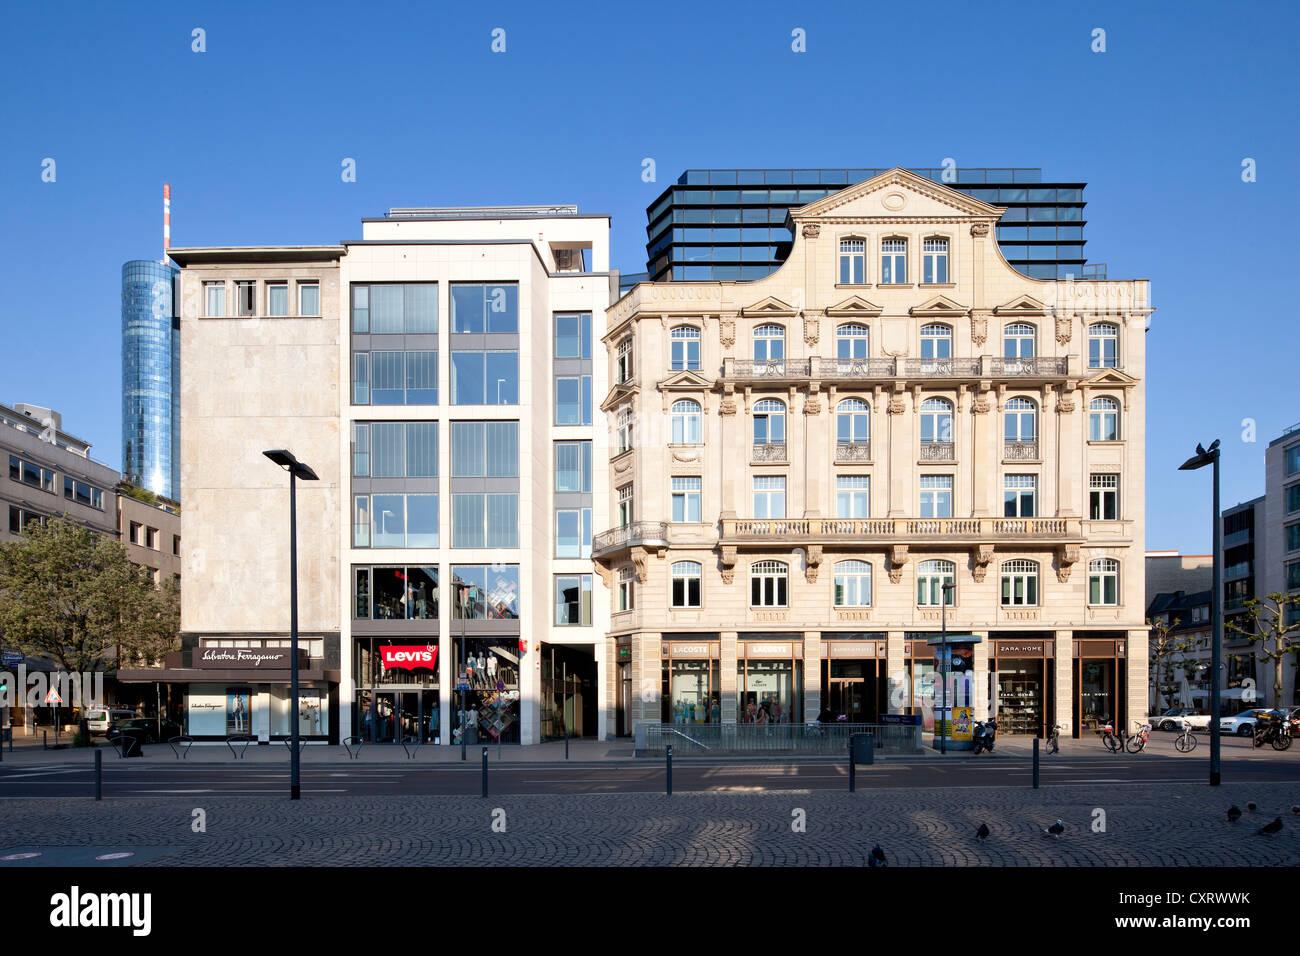 Uffici ed edifici retail su Rathenauplatz square, Frankfurt am Main, Hesse, Germania, Europa PublicGround Immagini Stock